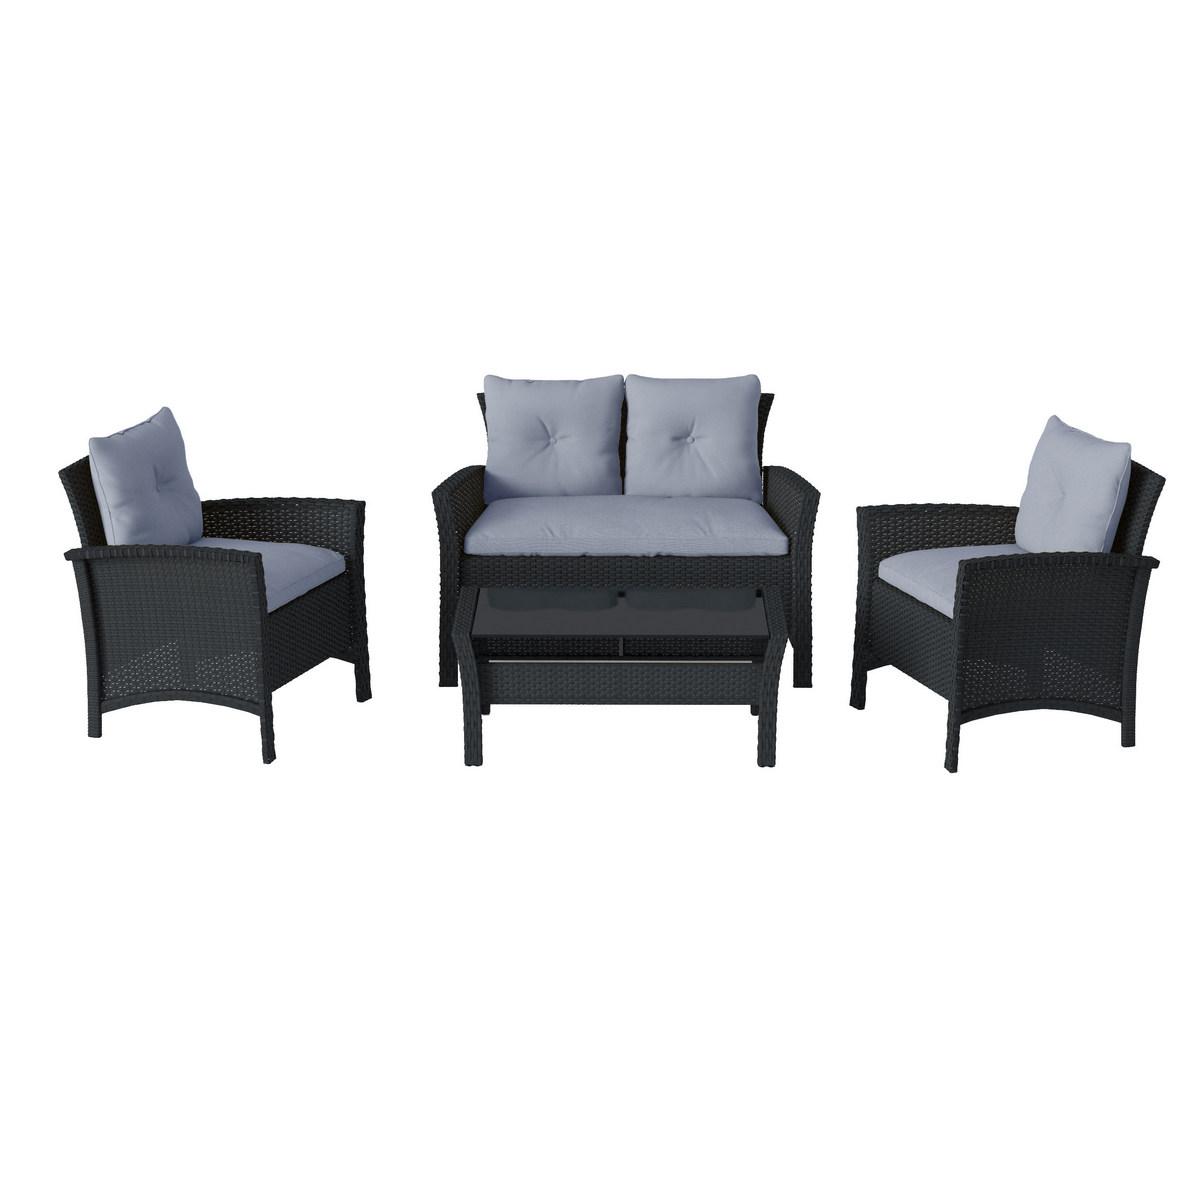 Corliving Black Resin Rattan Wicker Patio Set Light Blue Cushions